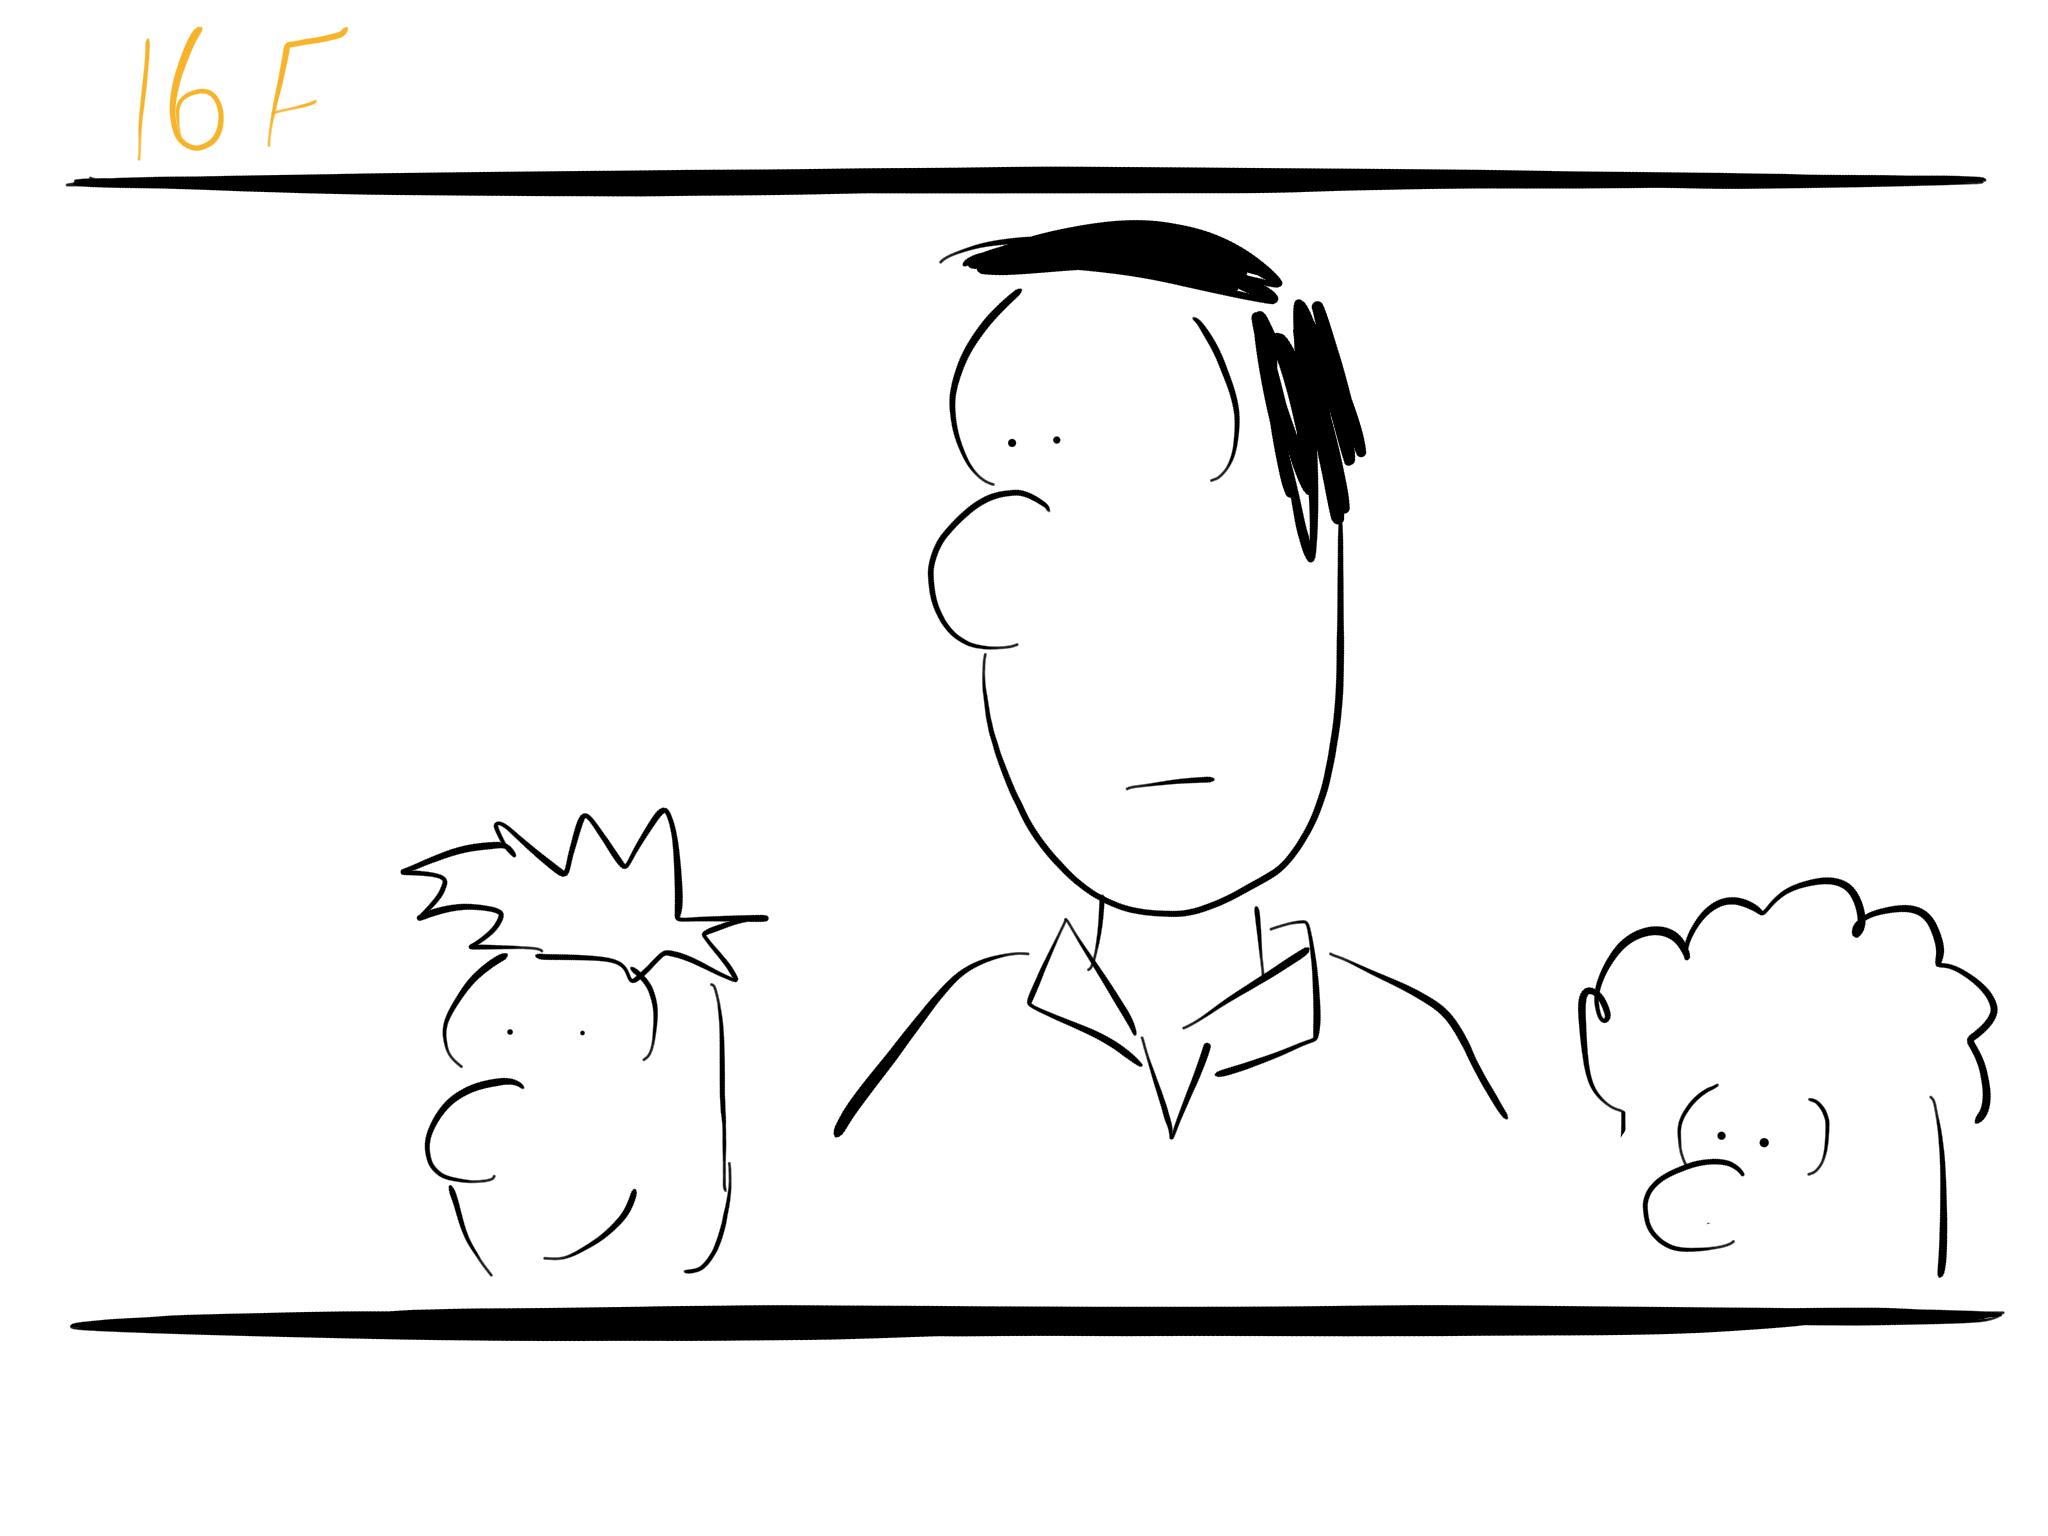 BDF_Storyboards_67.jpg